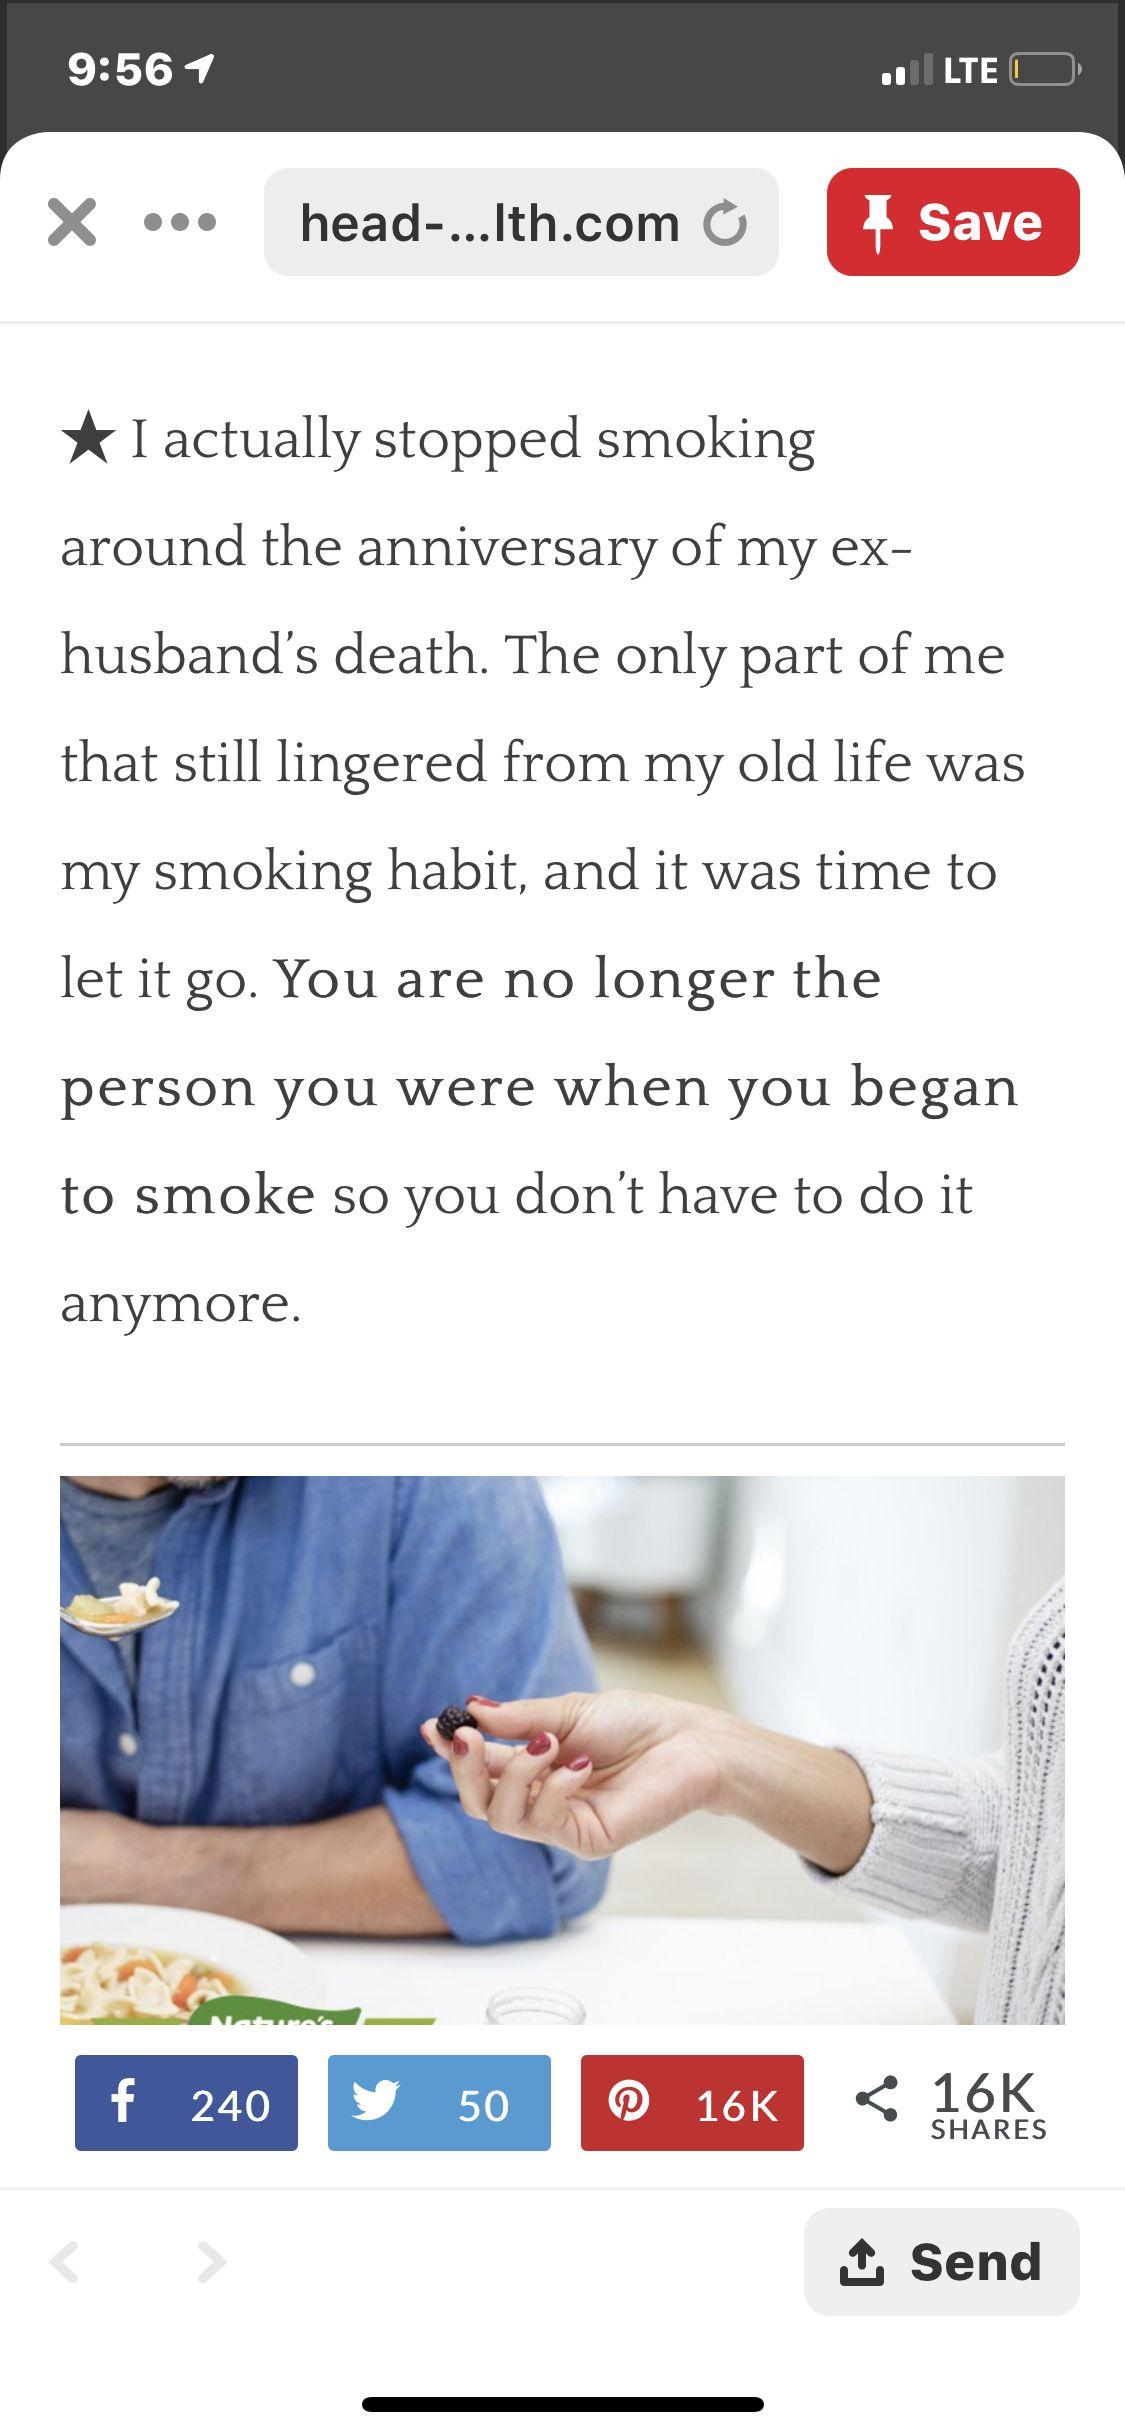 How Do I Get My Husband To Stop Smoking